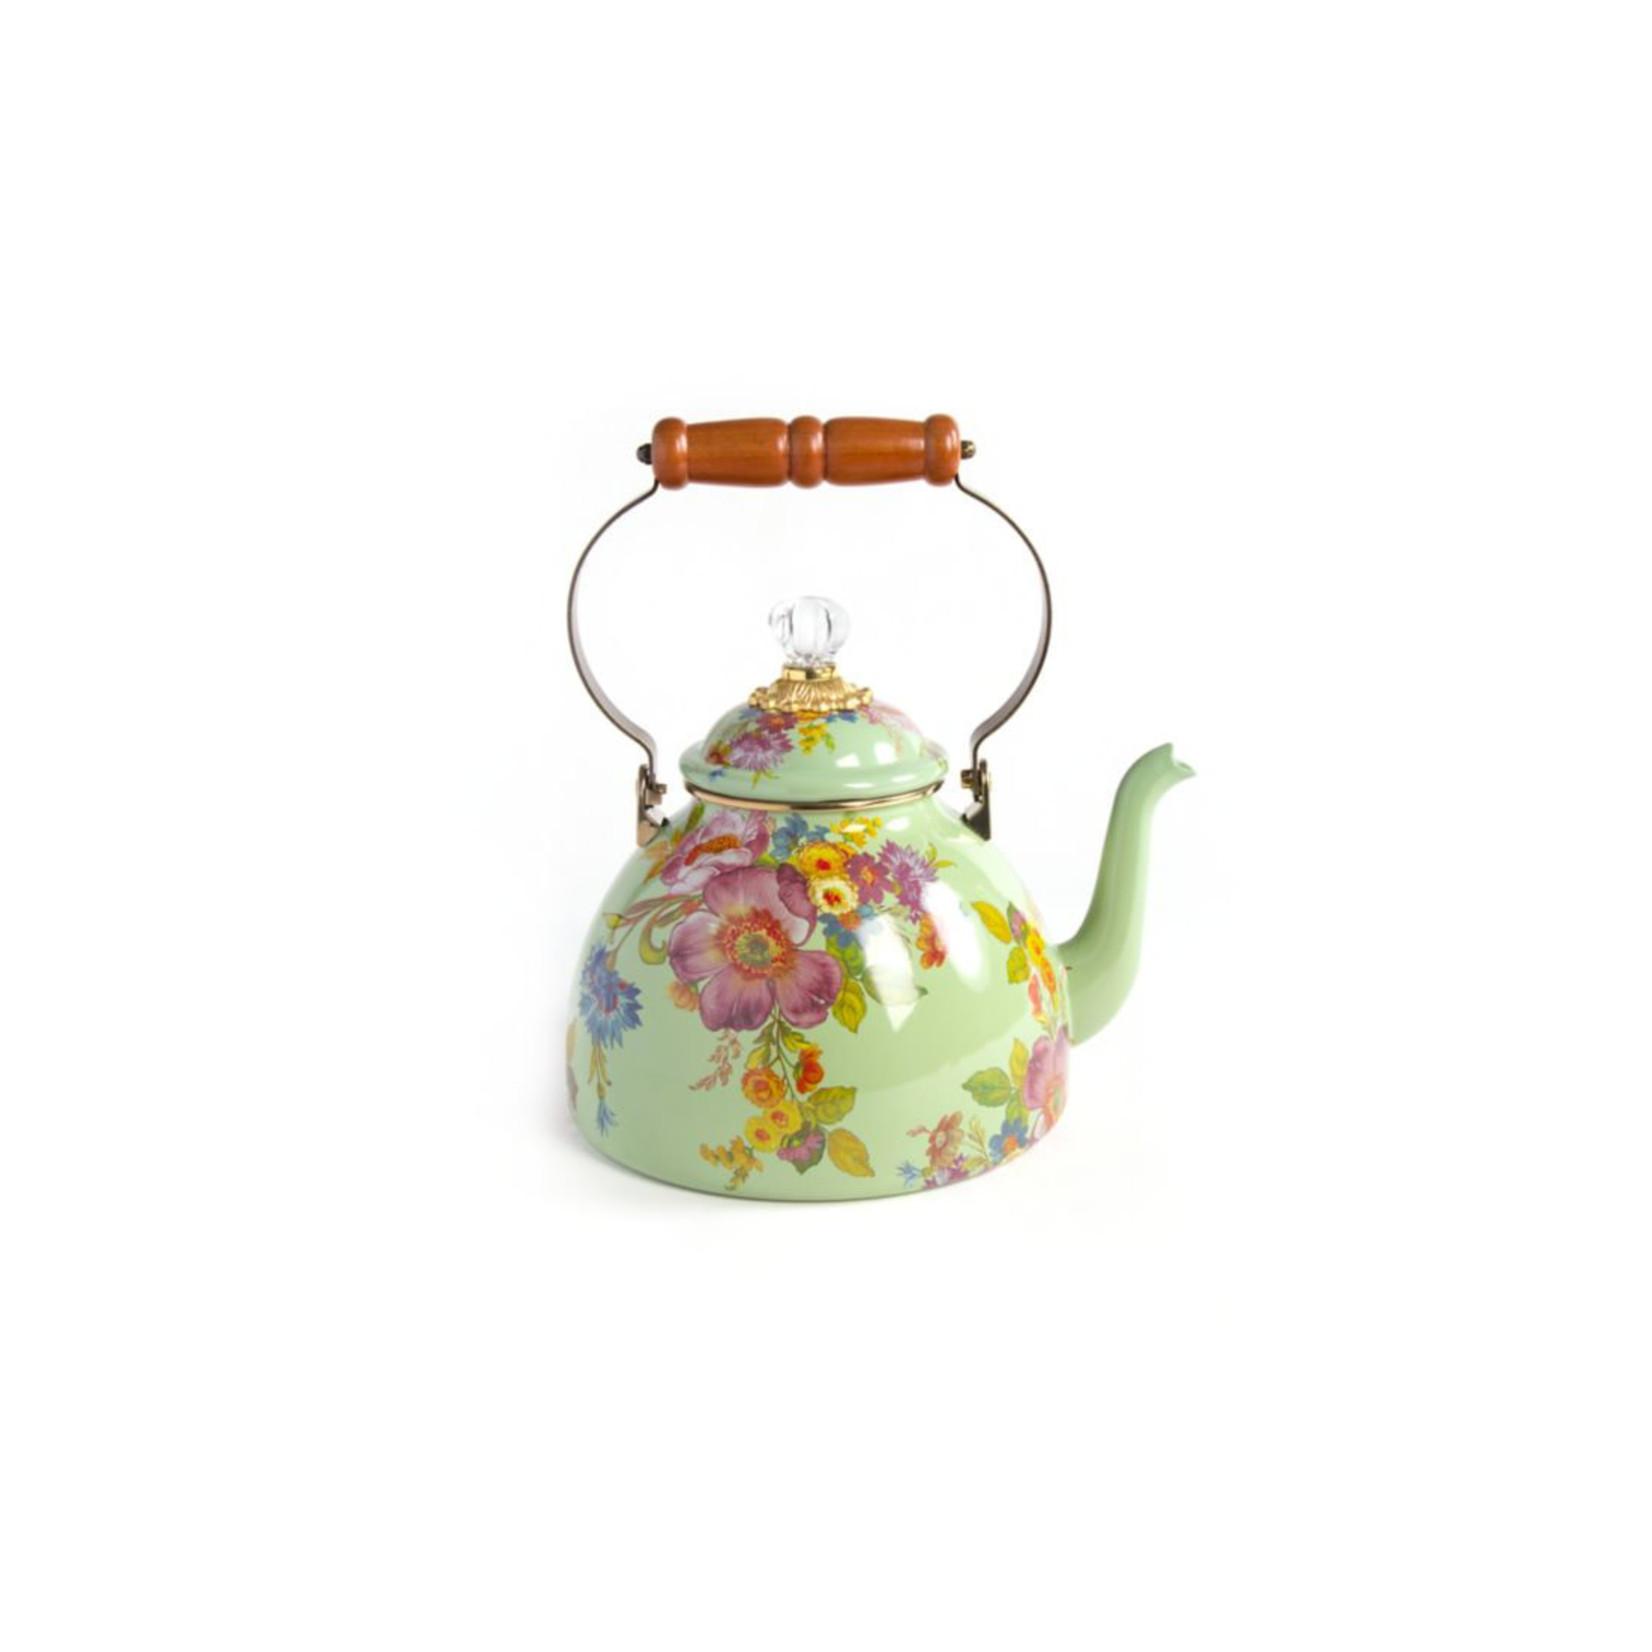 MacKenzie Childs Flower Market 3 Quart Tea Kettle - Green